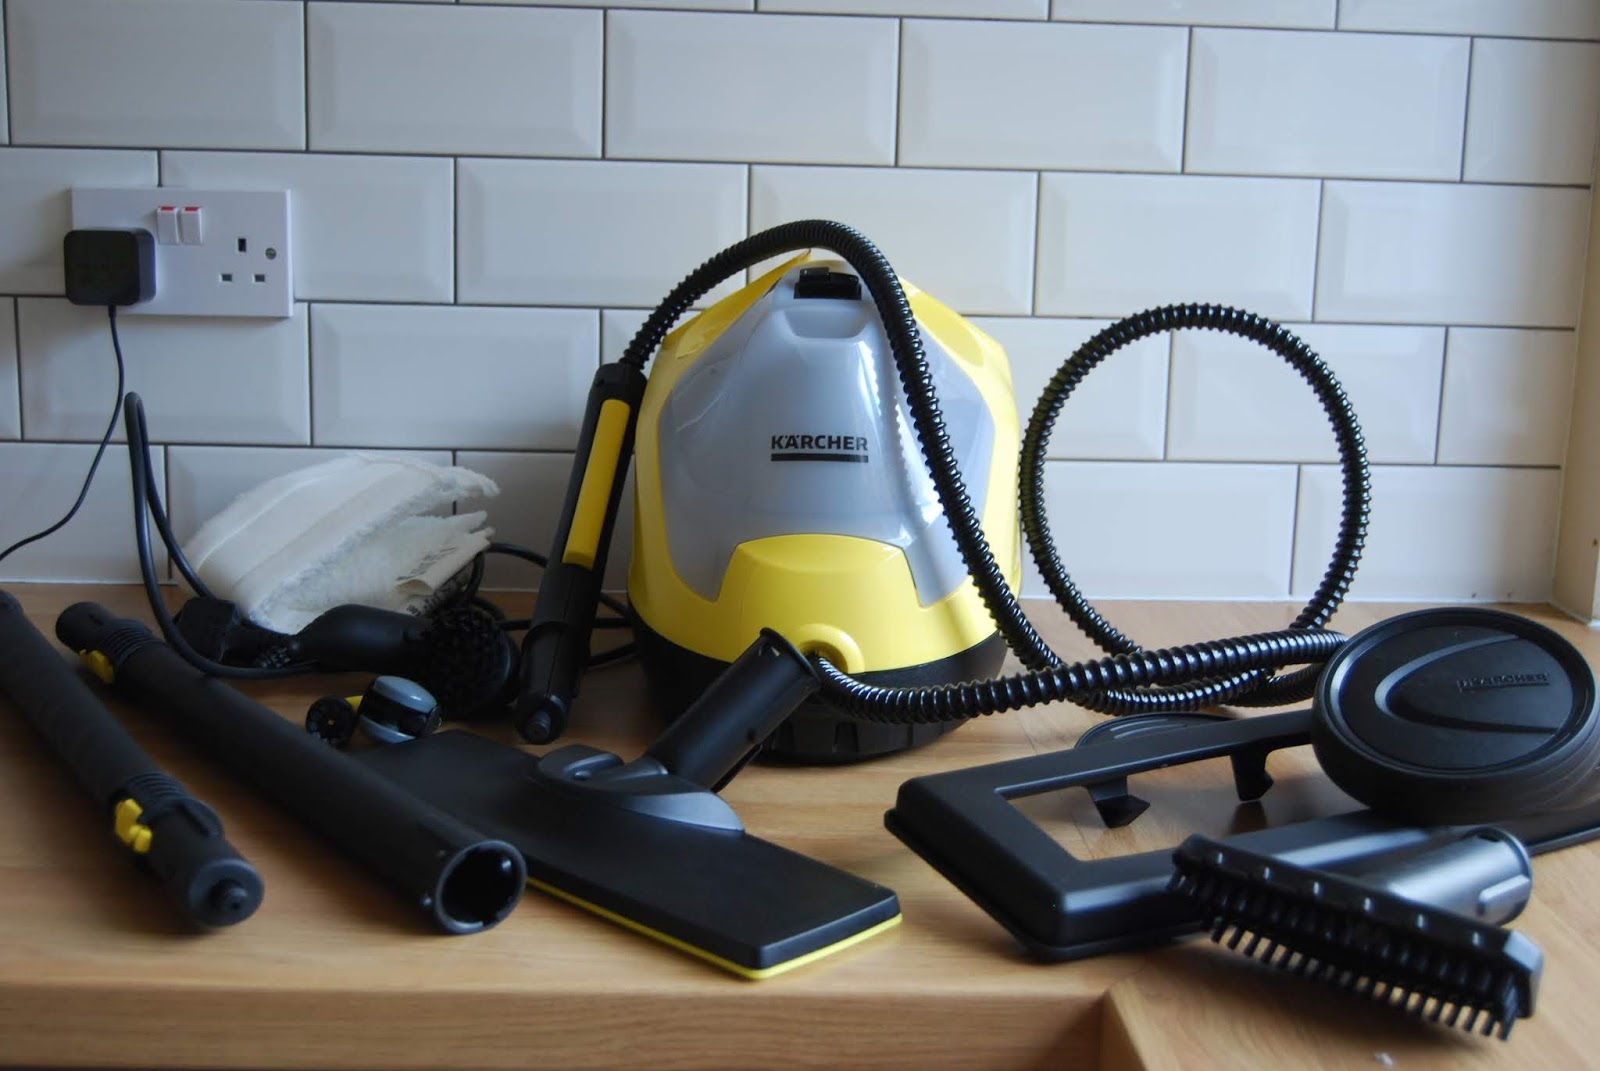 chic geek diary k rcher sc 4 easyfix premium steam cleaner review. Black Bedroom Furniture Sets. Home Design Ideas